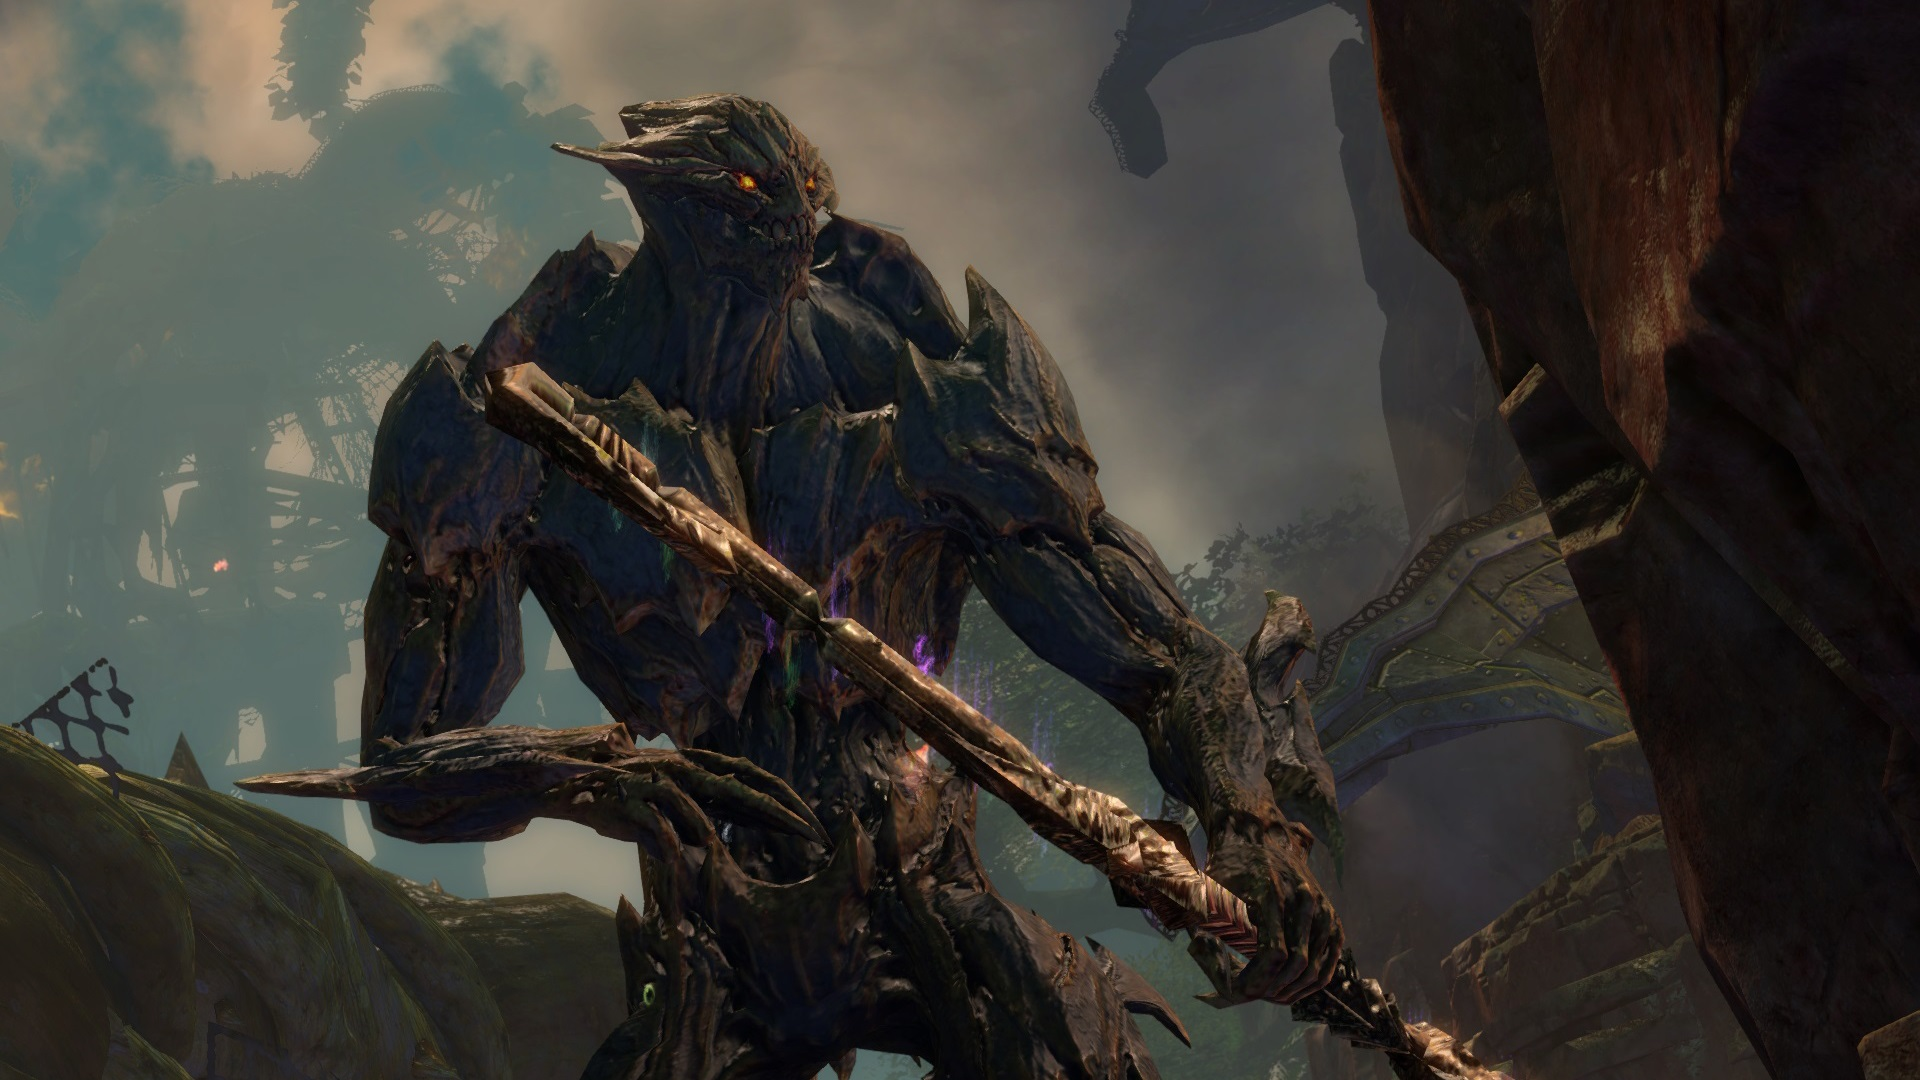 The Elder Scrolls V: Skyrim Reviews - GameSpot